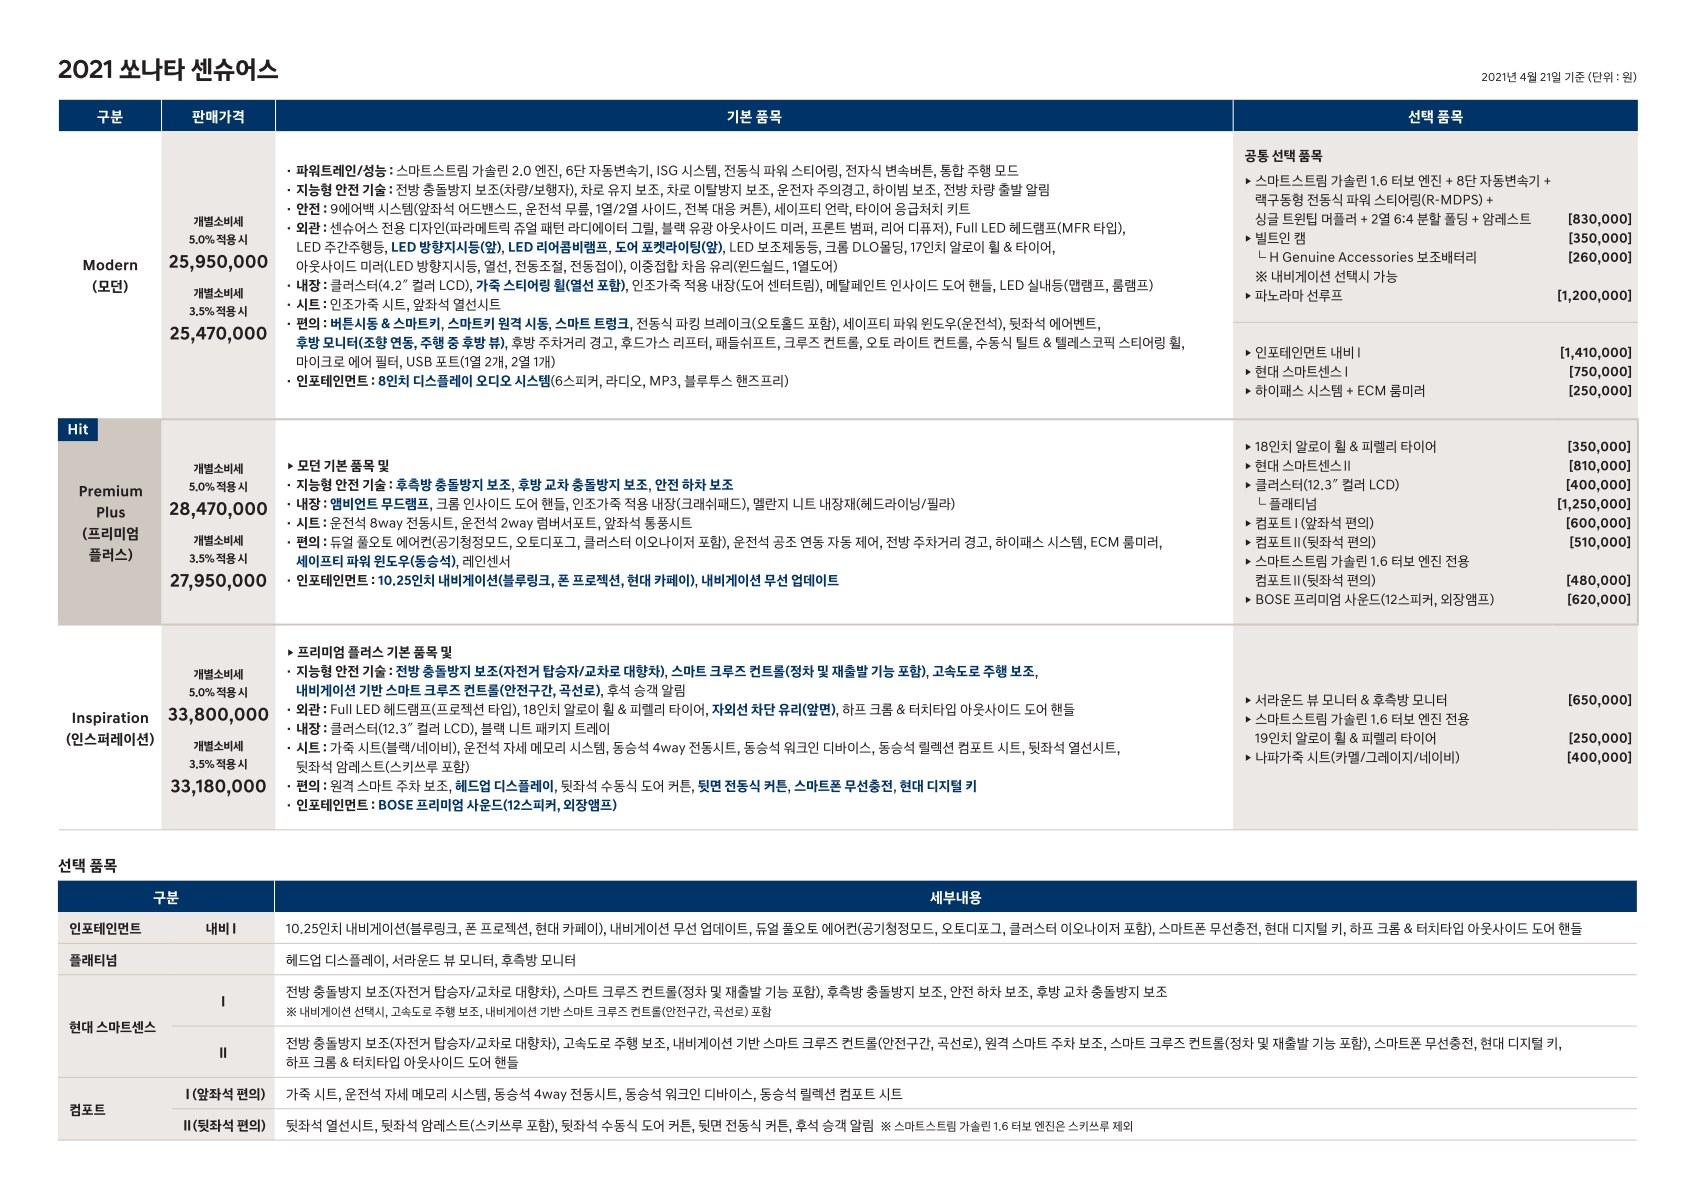 sonata-price_02.jpg